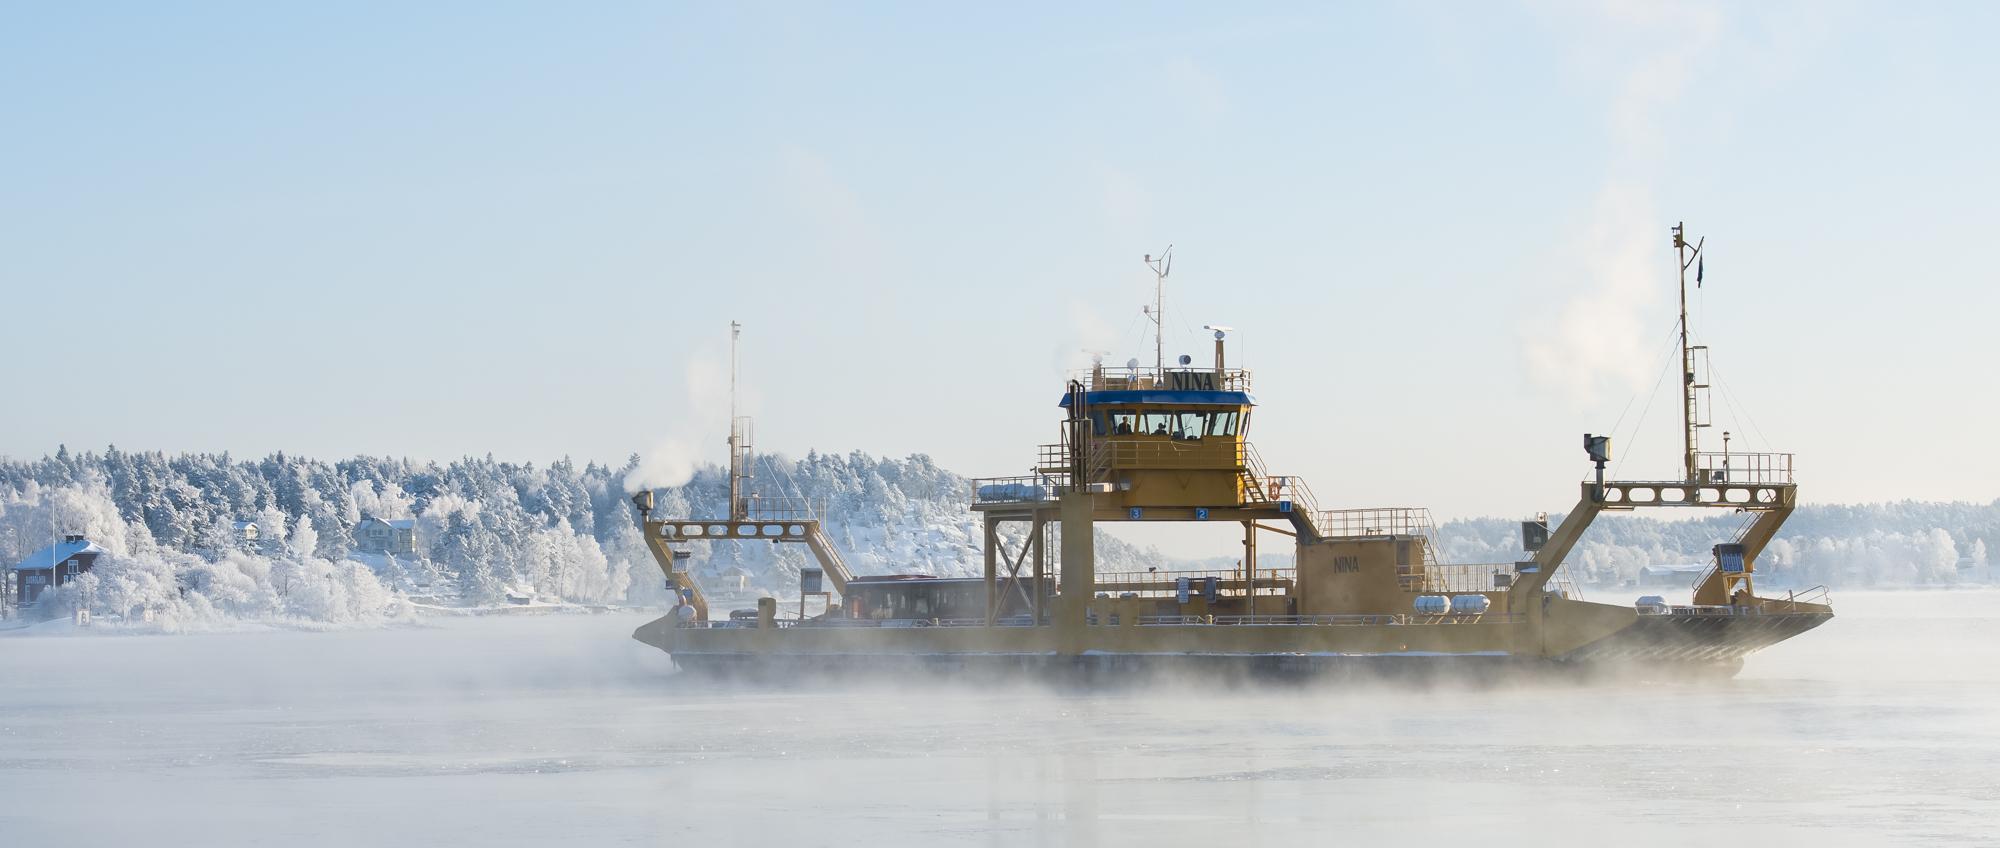 2020-01 FotaJanuari Håkan Waltgård Waxholmsfärja